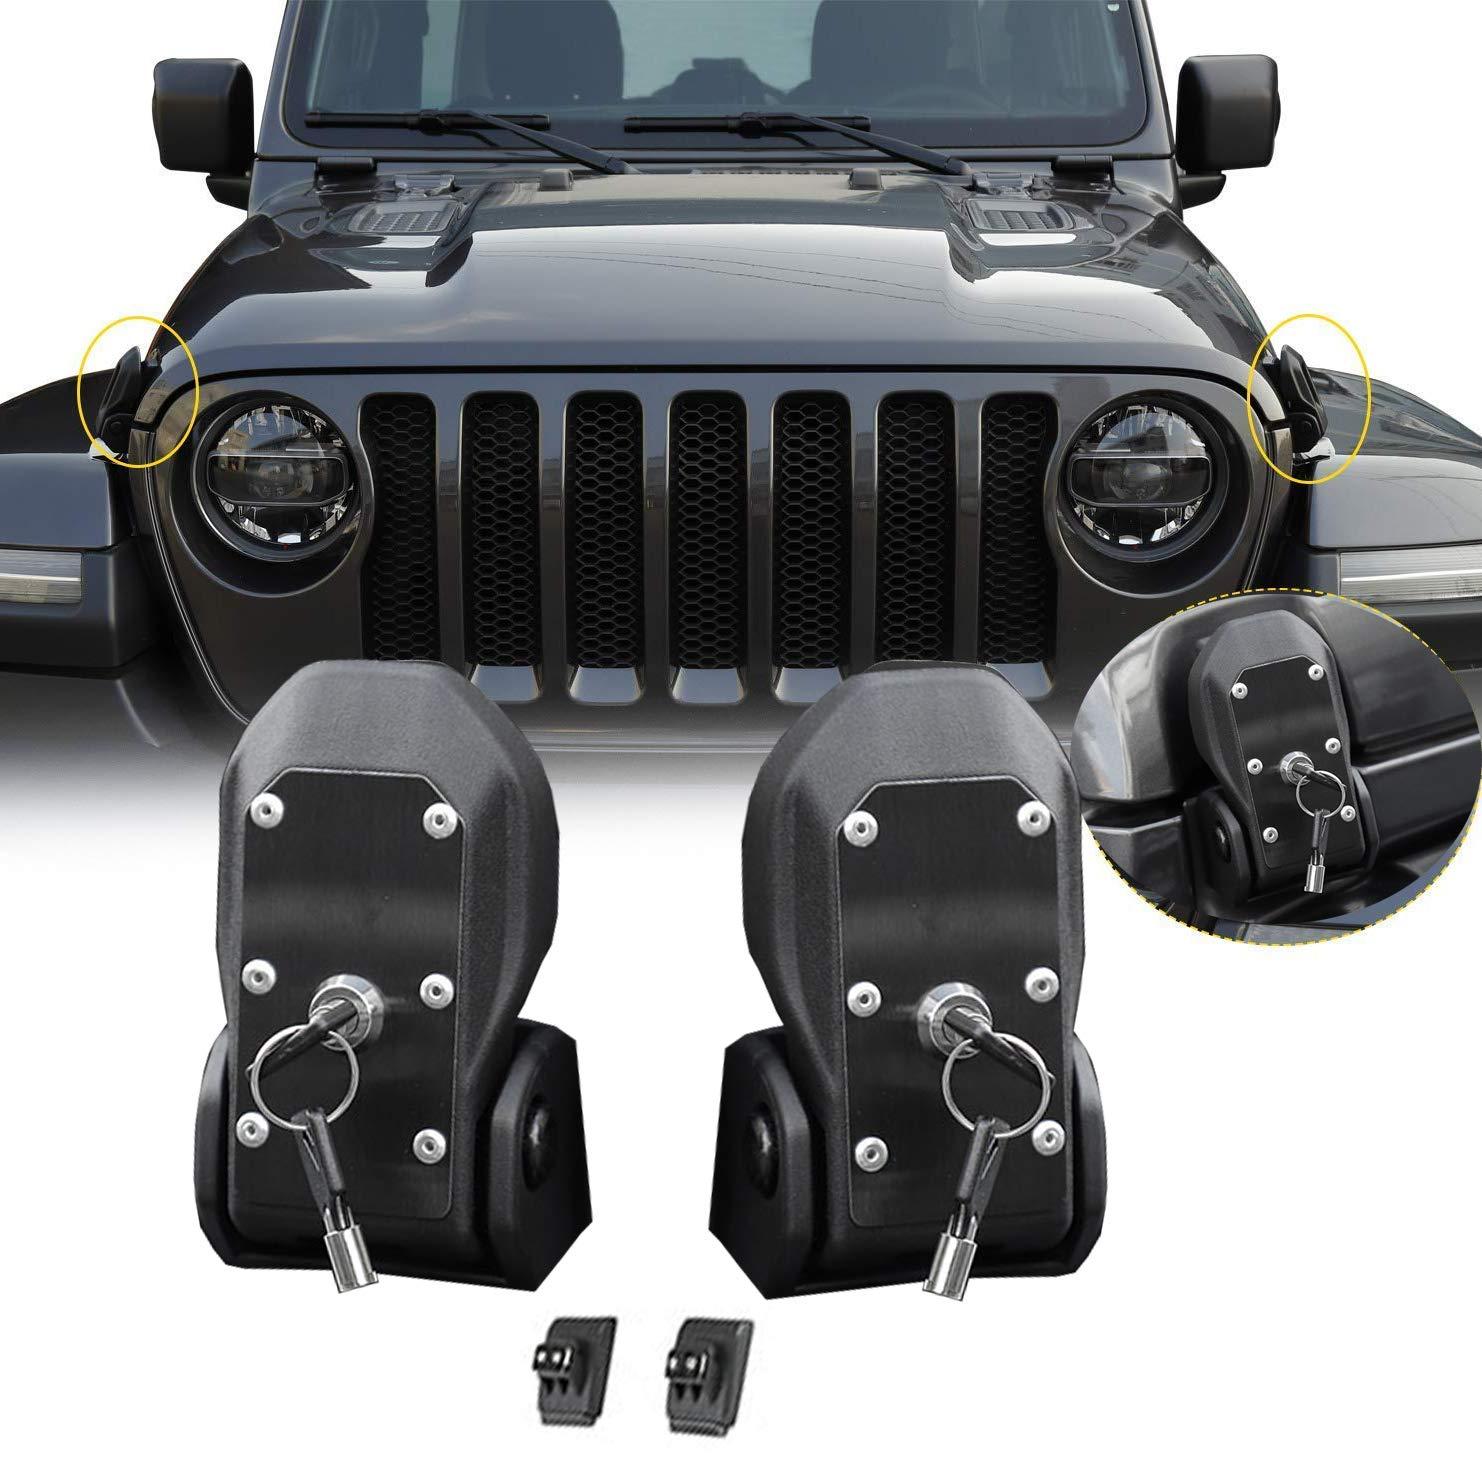 Modificaci/ón de la Tapa del Motor con Cerradura,Anti-Robo,Originalcar LAUTO Coche Cubierta Original del Acero Inoxidable de pestillo de la Cubierta Kit aplicable a 2018 Jeep Wrangler JL